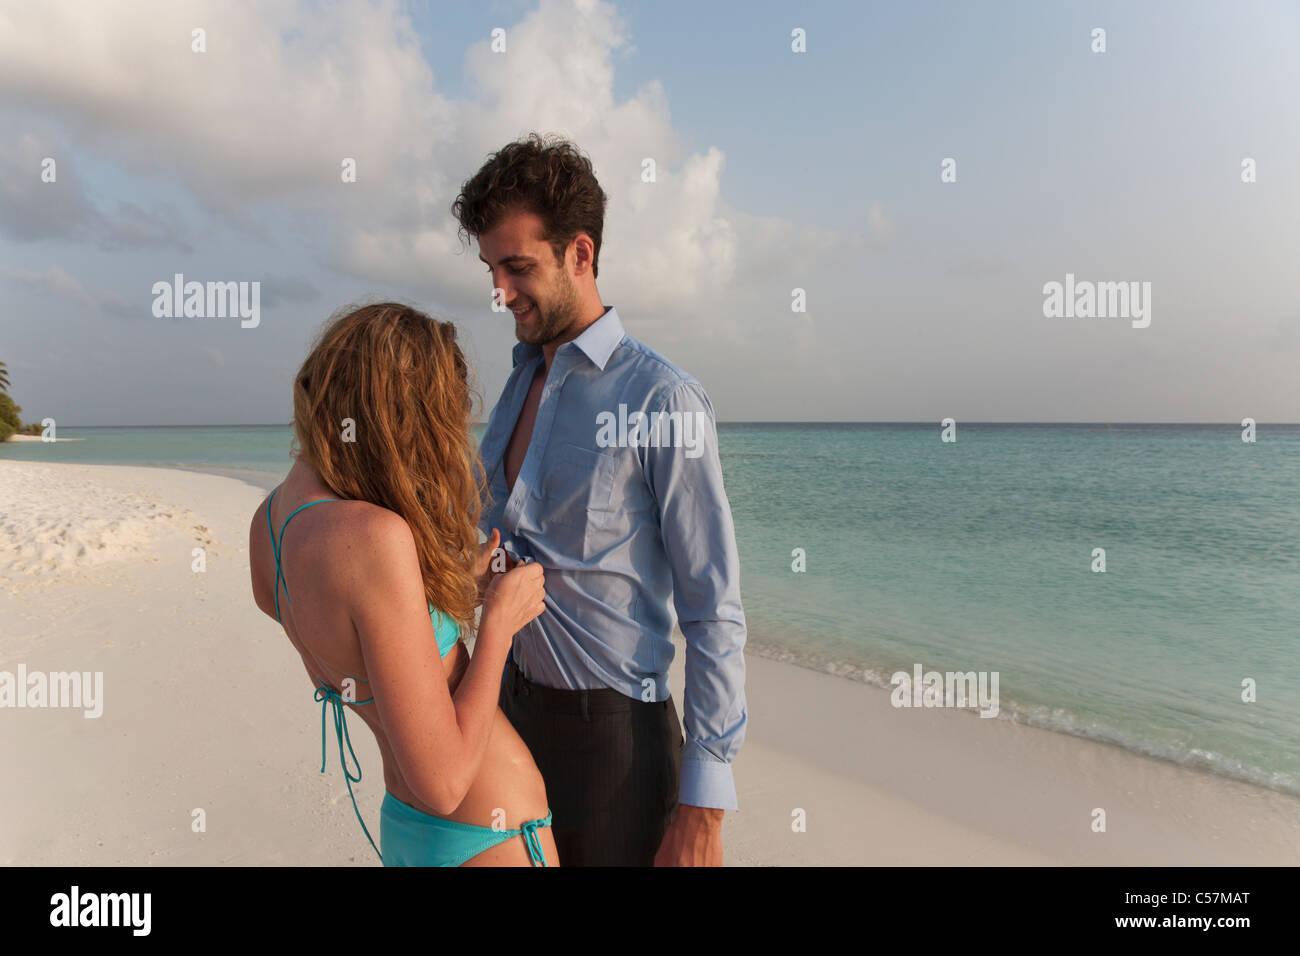 Frau ausziehen Geschäftsmann am Strand Stockbild